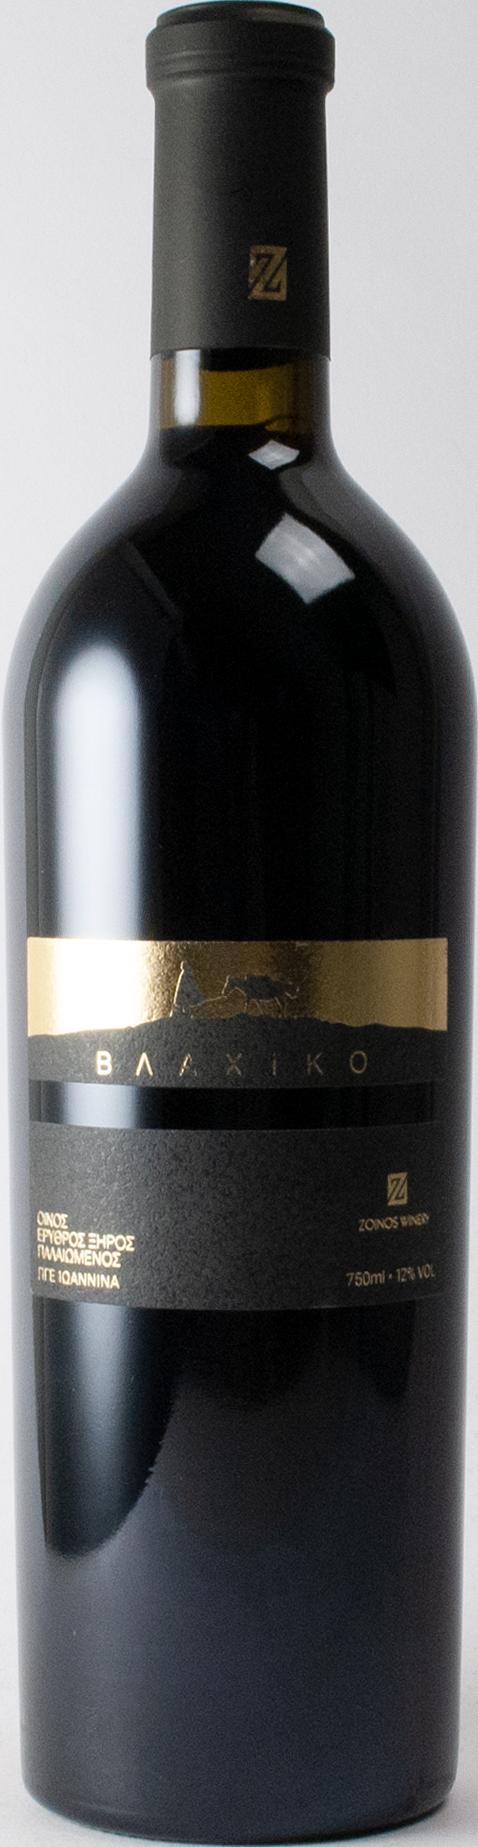 Vlahiko 2017 - Zoinos Winery